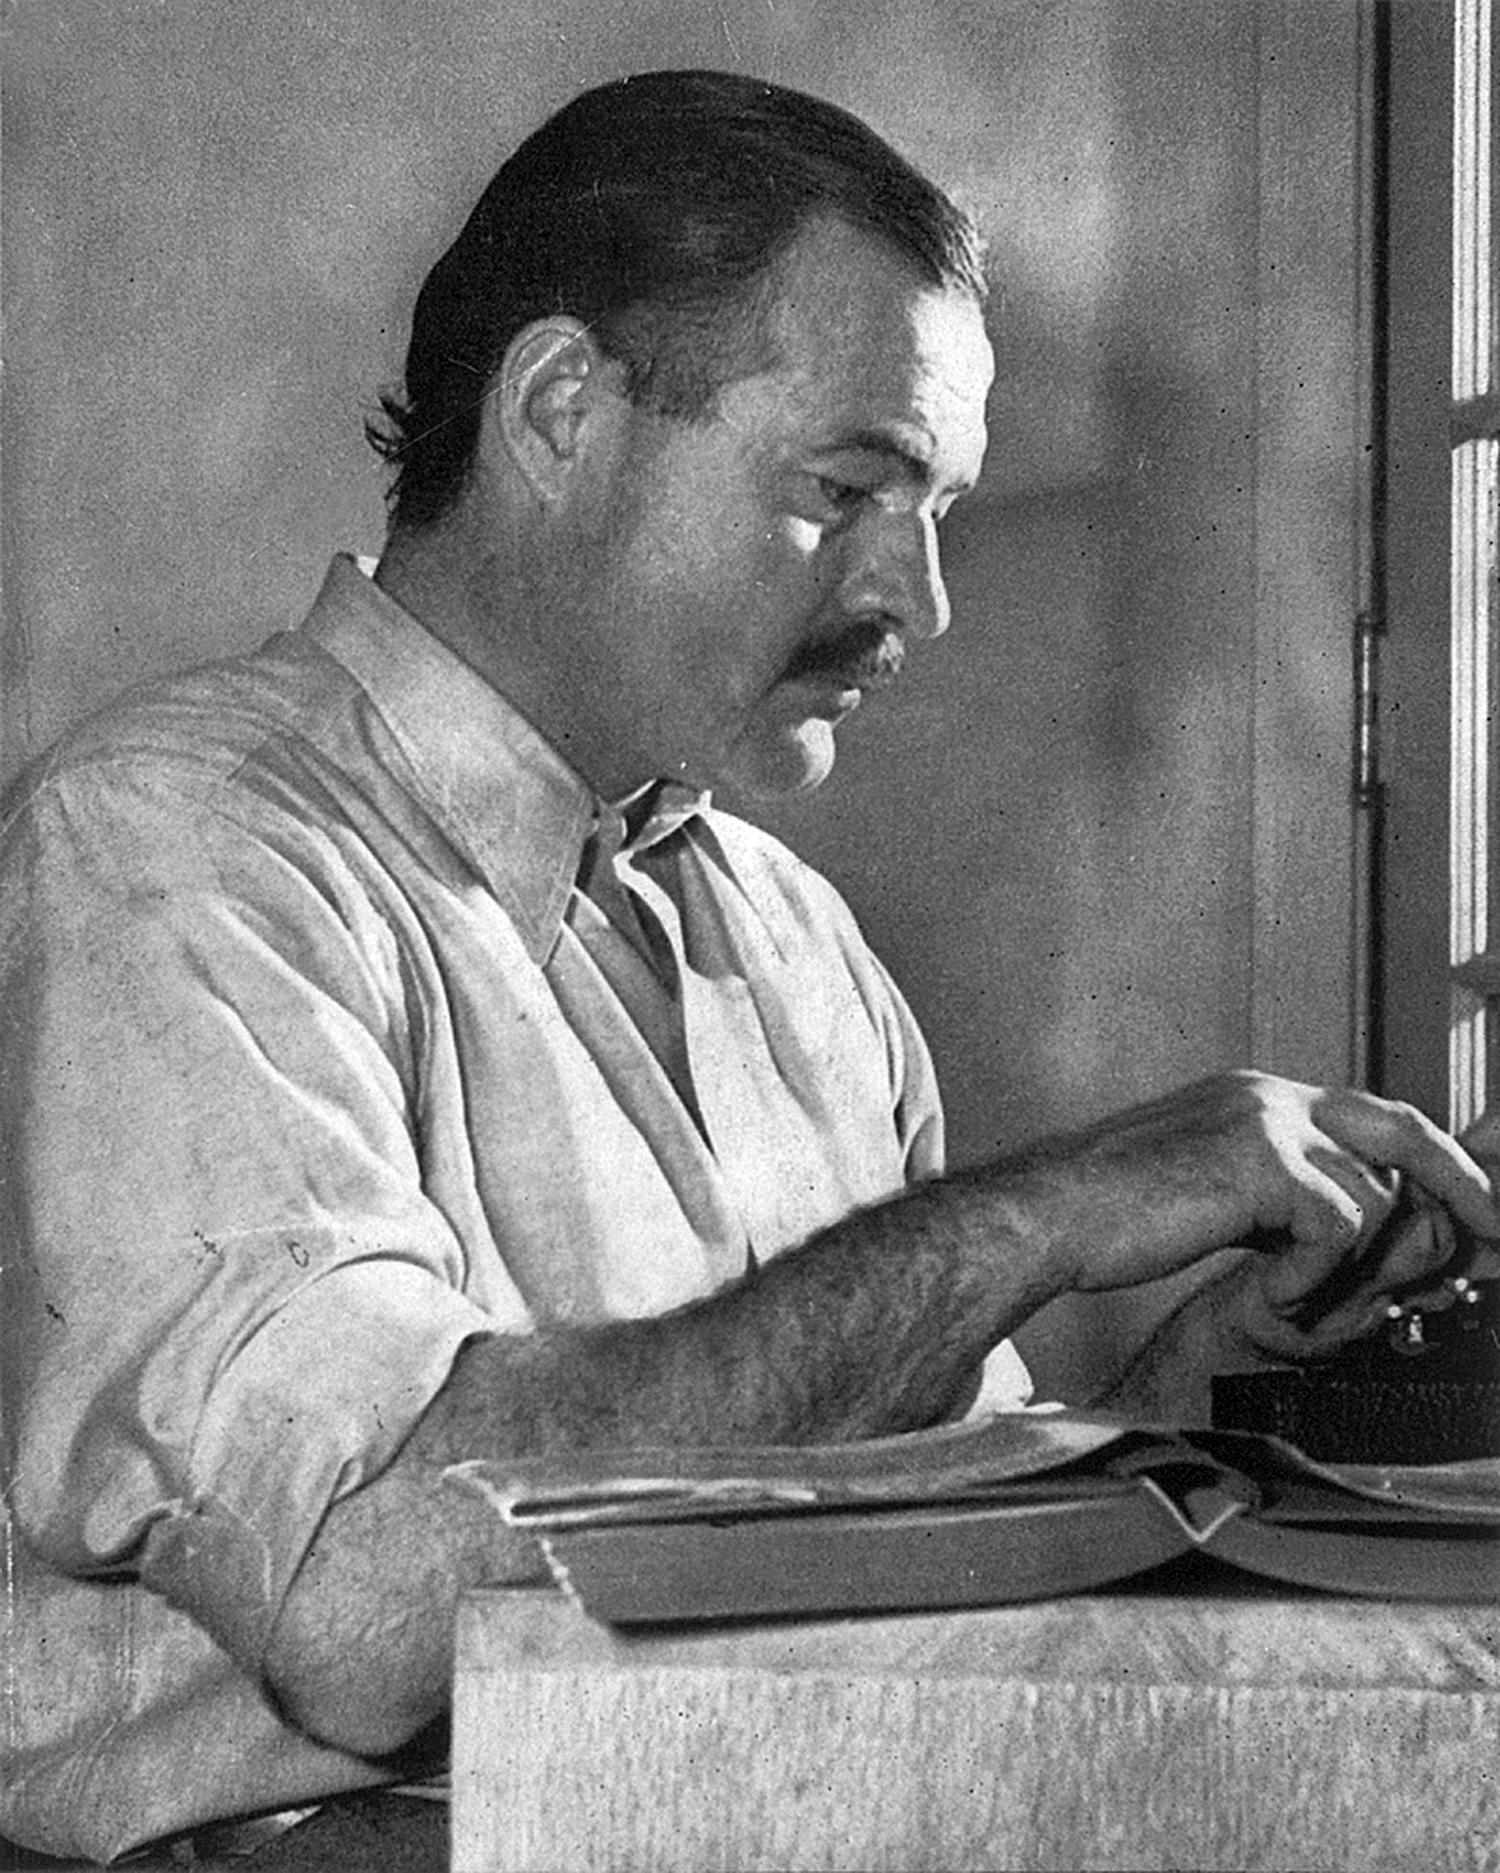 Nobel Prize Winner Ernest Hemingway